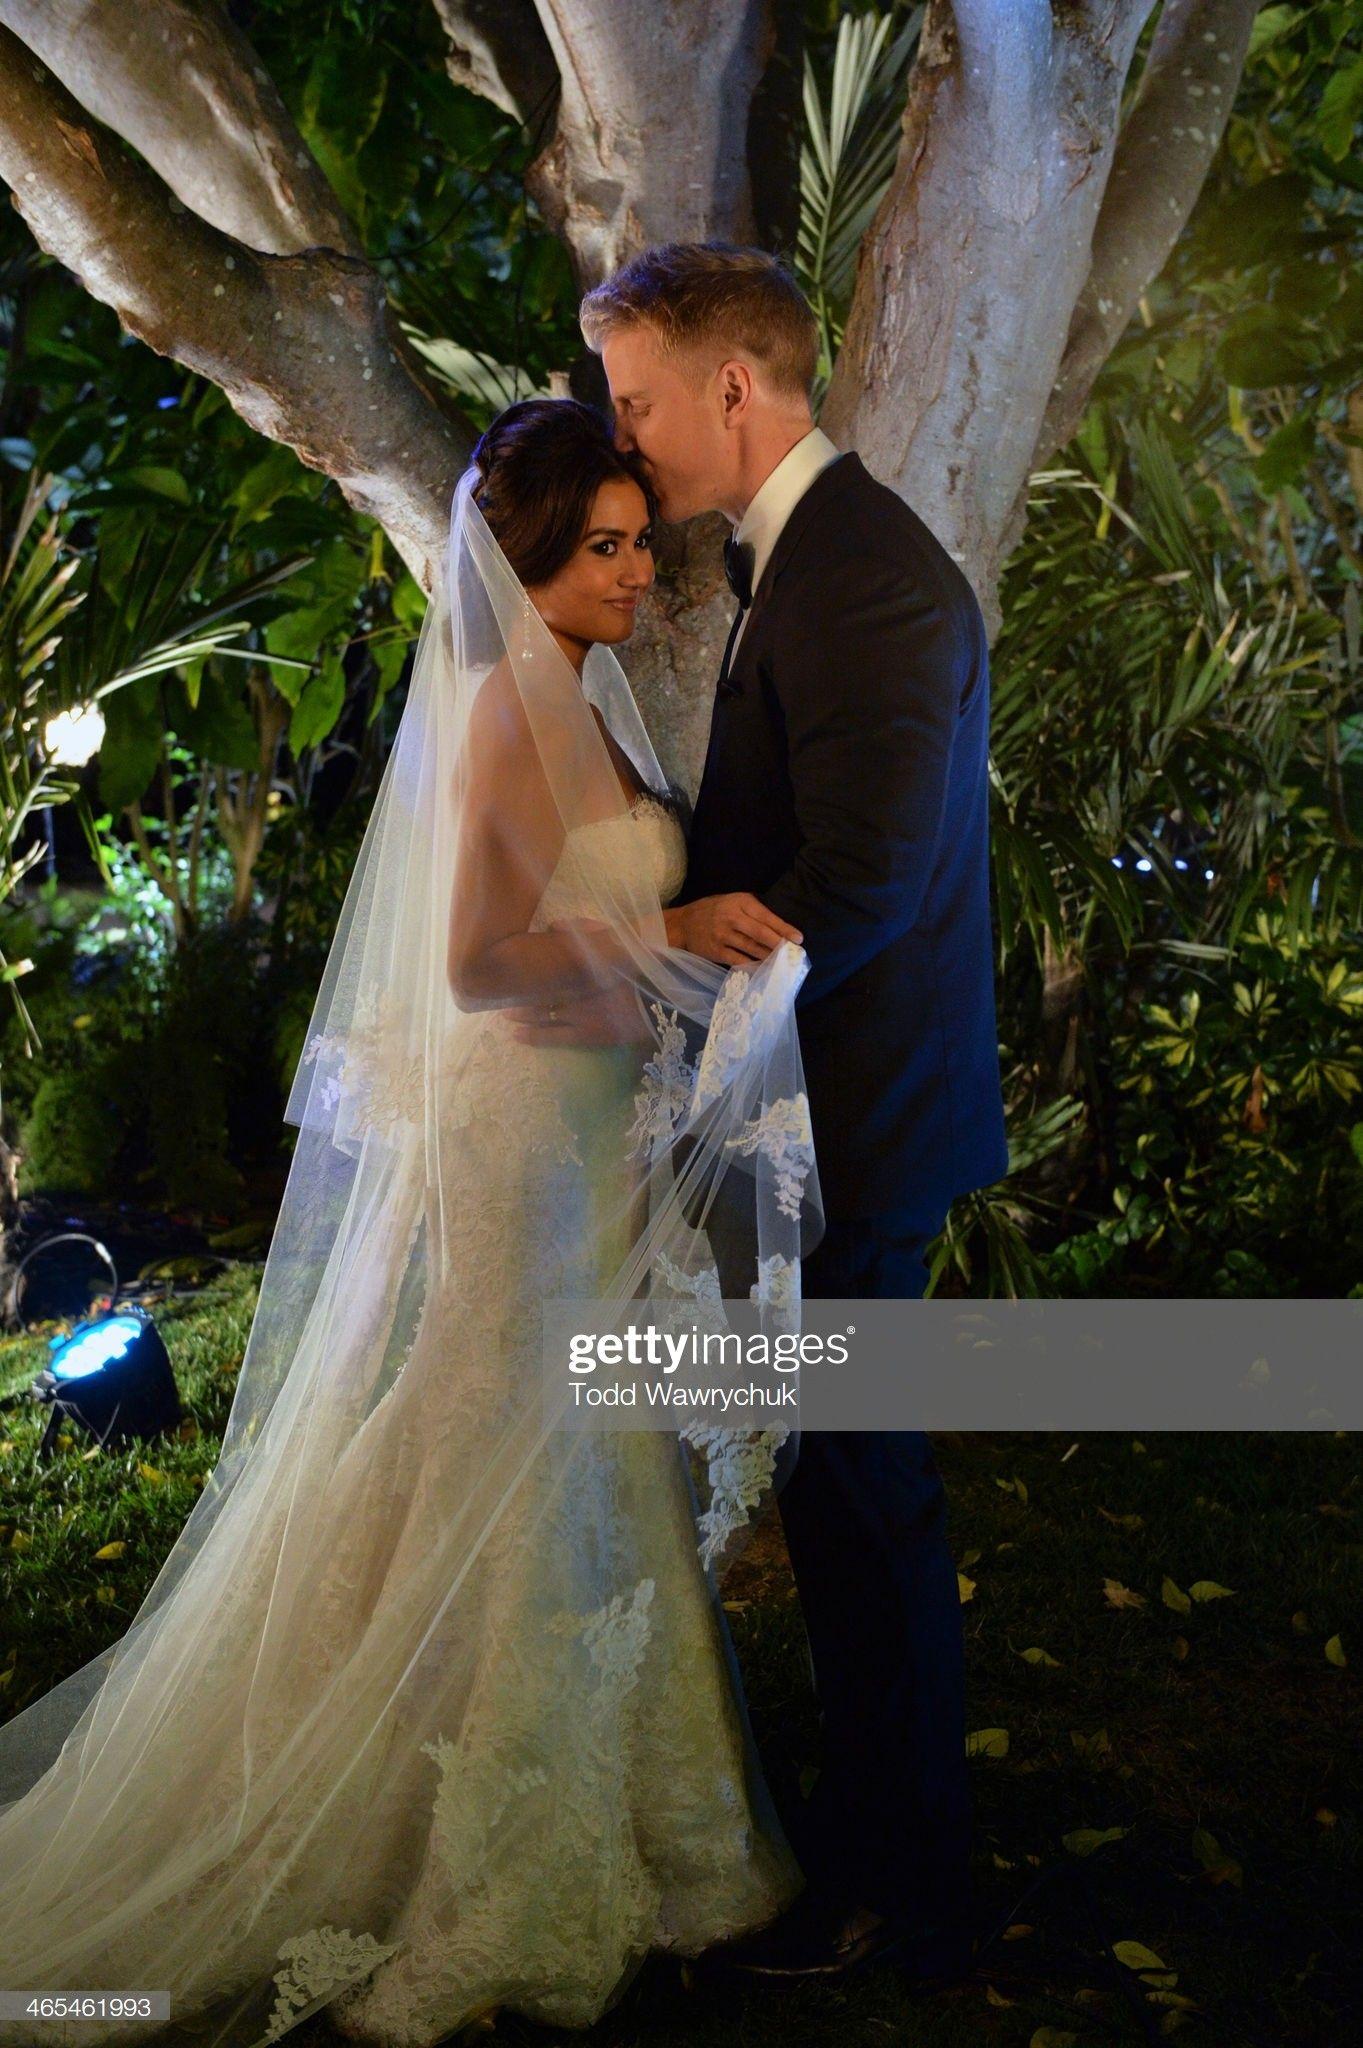 The Bachelor Season 17 Sean Lowe And Catherine Giudici Wedding Bachelor Wedding Wedding Renewal Wedding